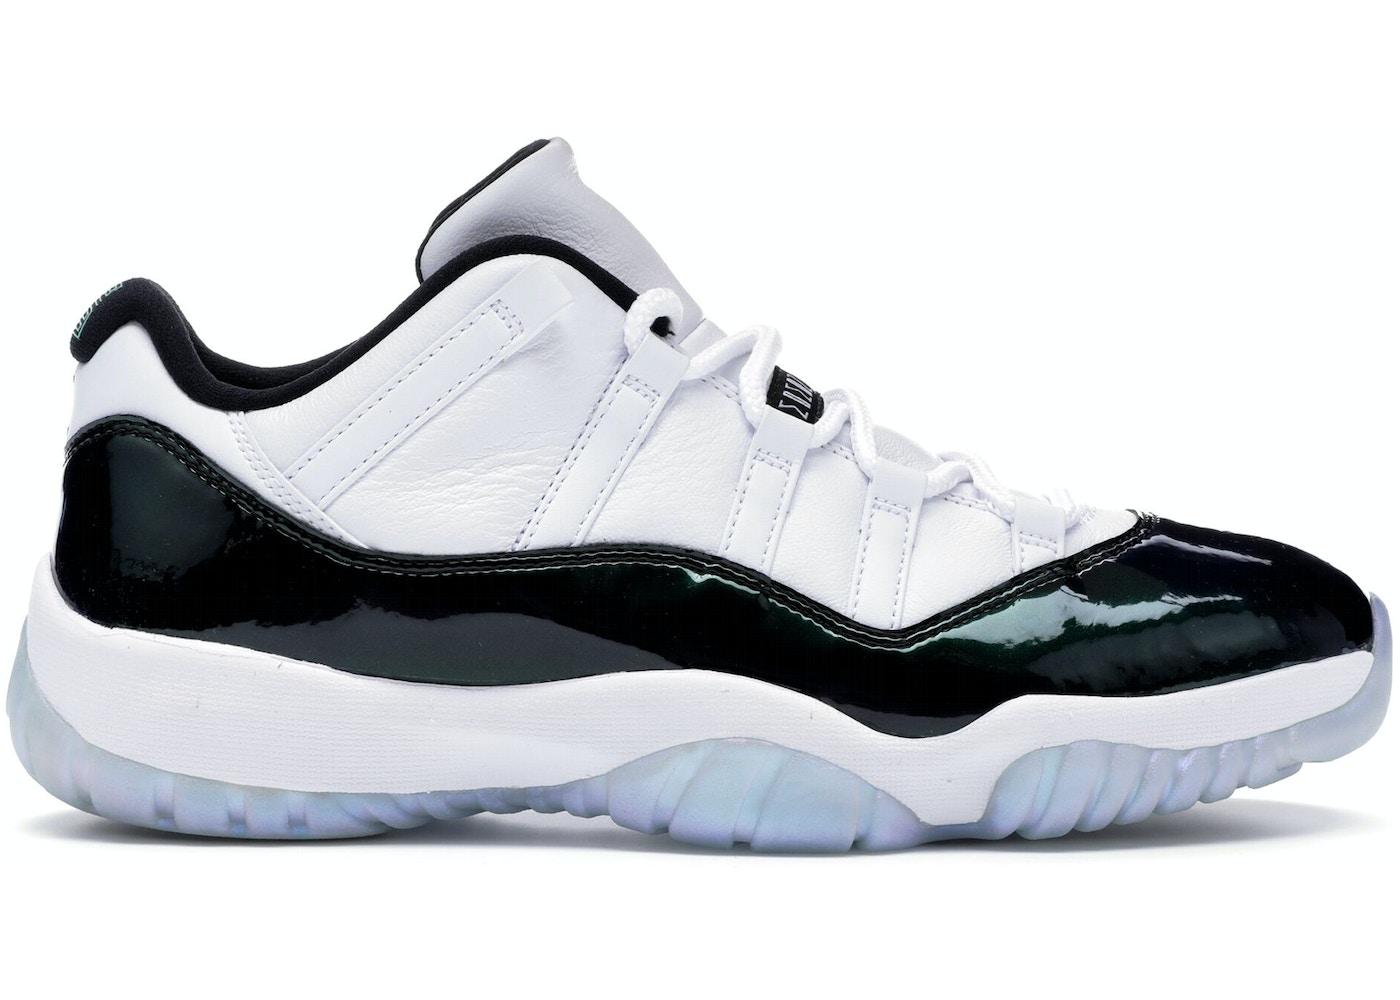 d8d56fcc763d80 Buy Air Jordan 11 Shoes   Deadstock Sneakers